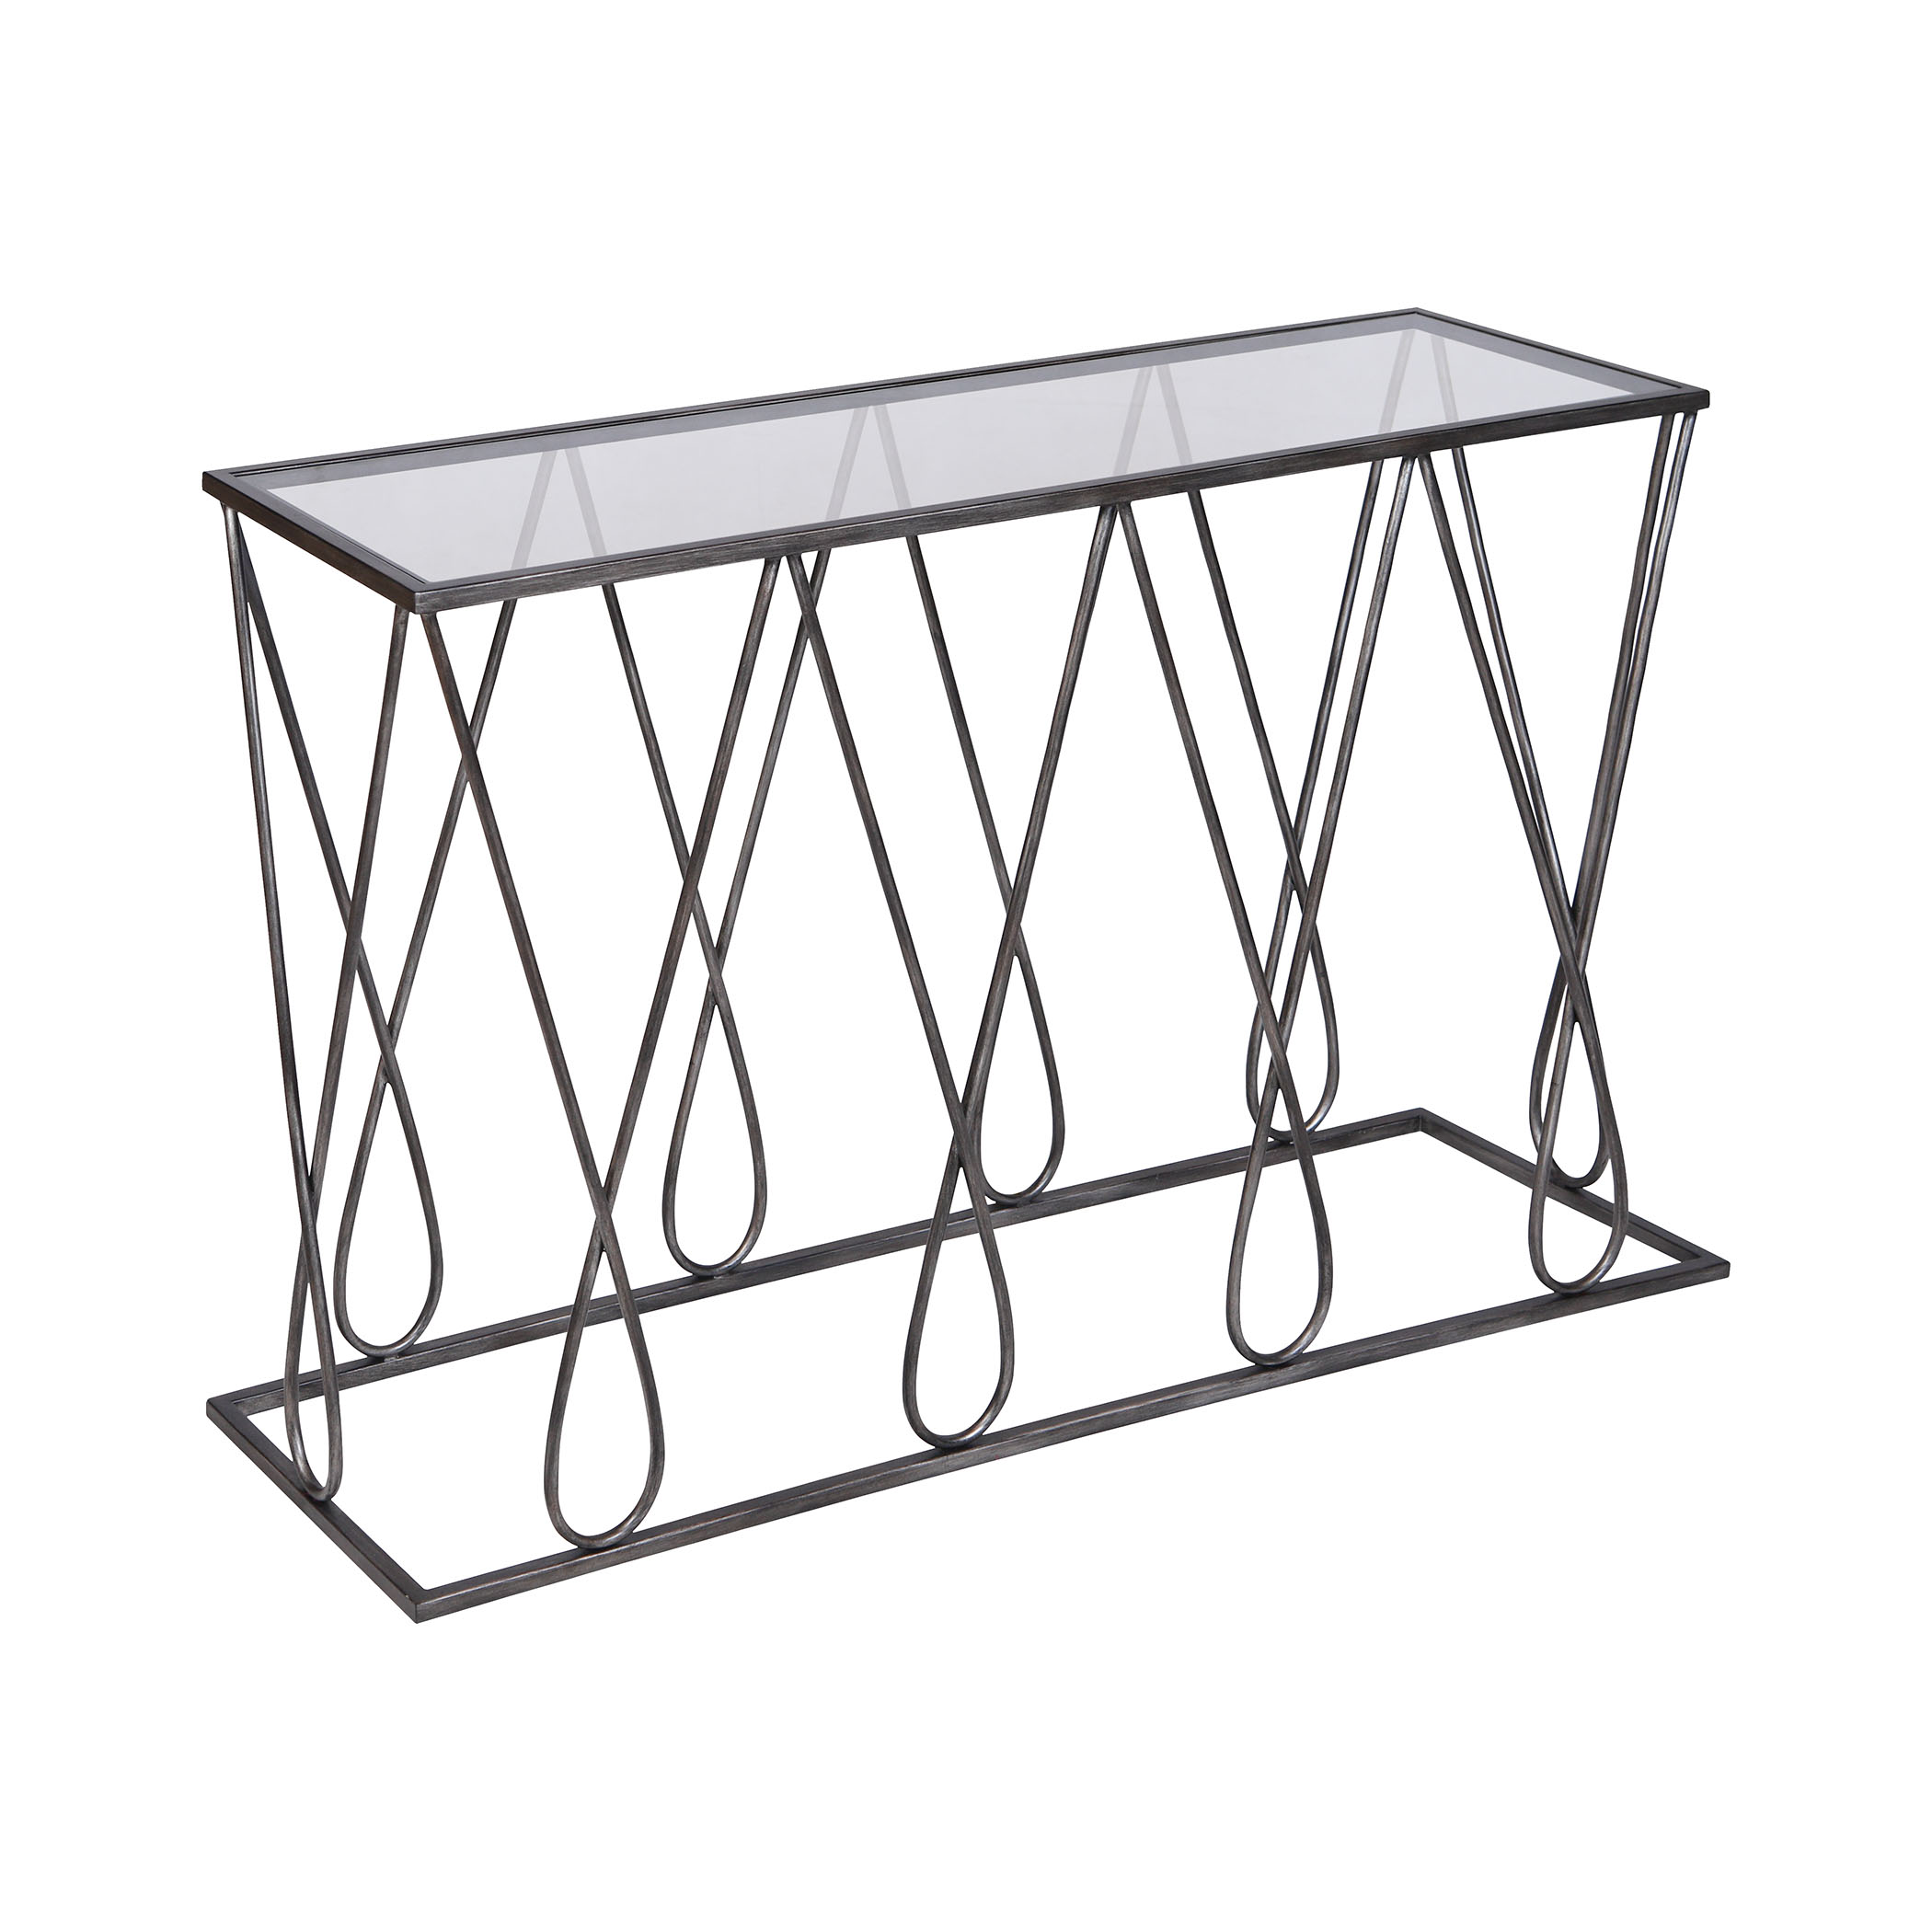 Neutro Console Table 164-014 | ELK Home